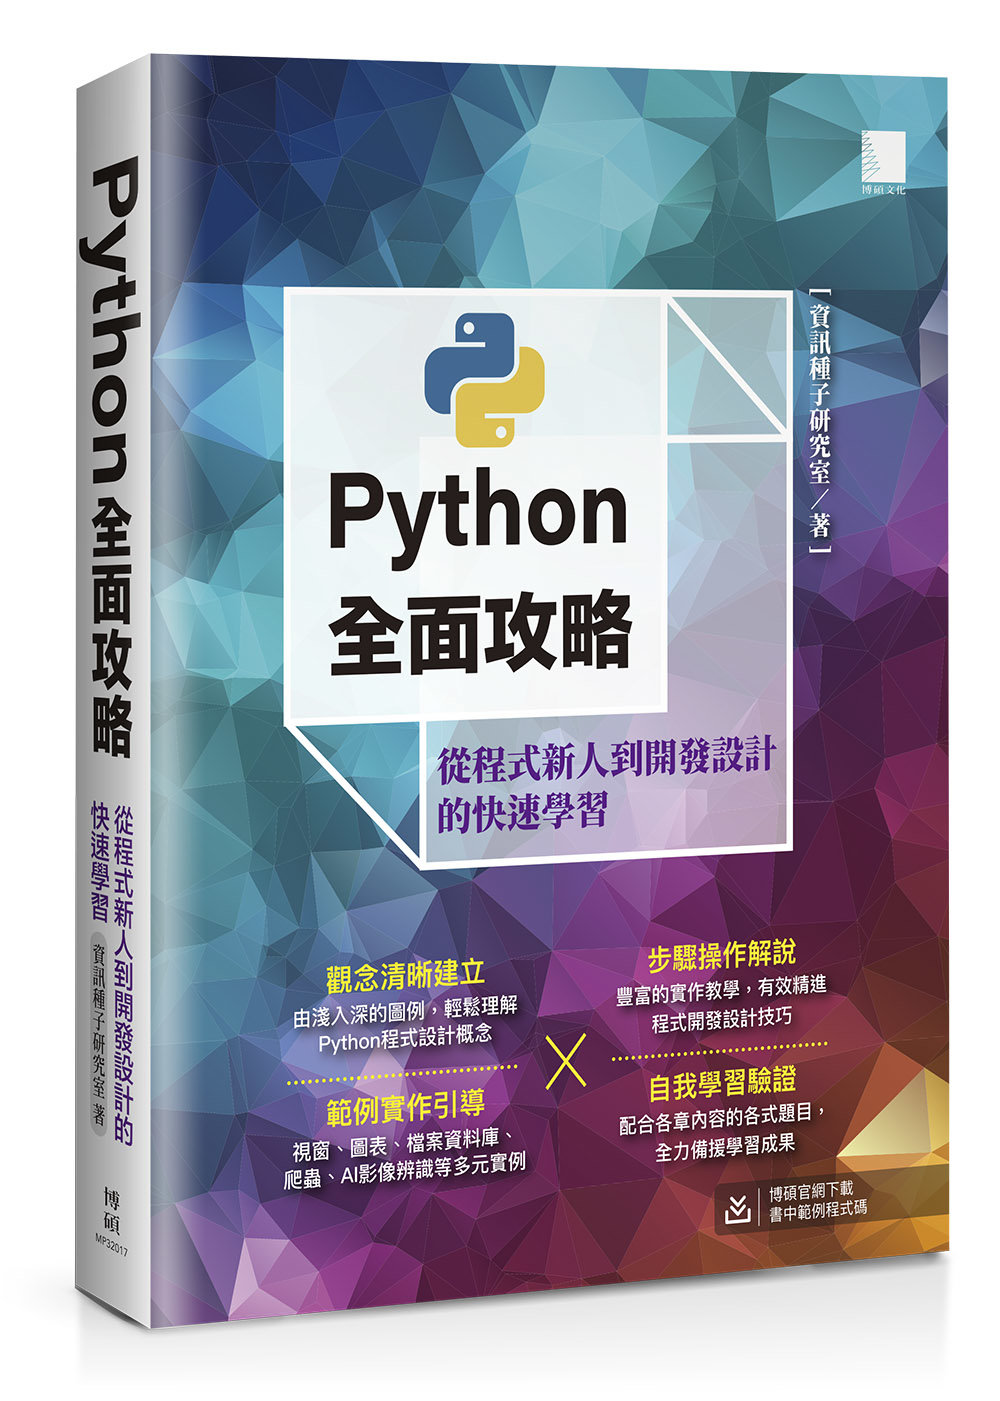 Python 全面攻略:從程式新人到開發設計的快速學習-preview-1